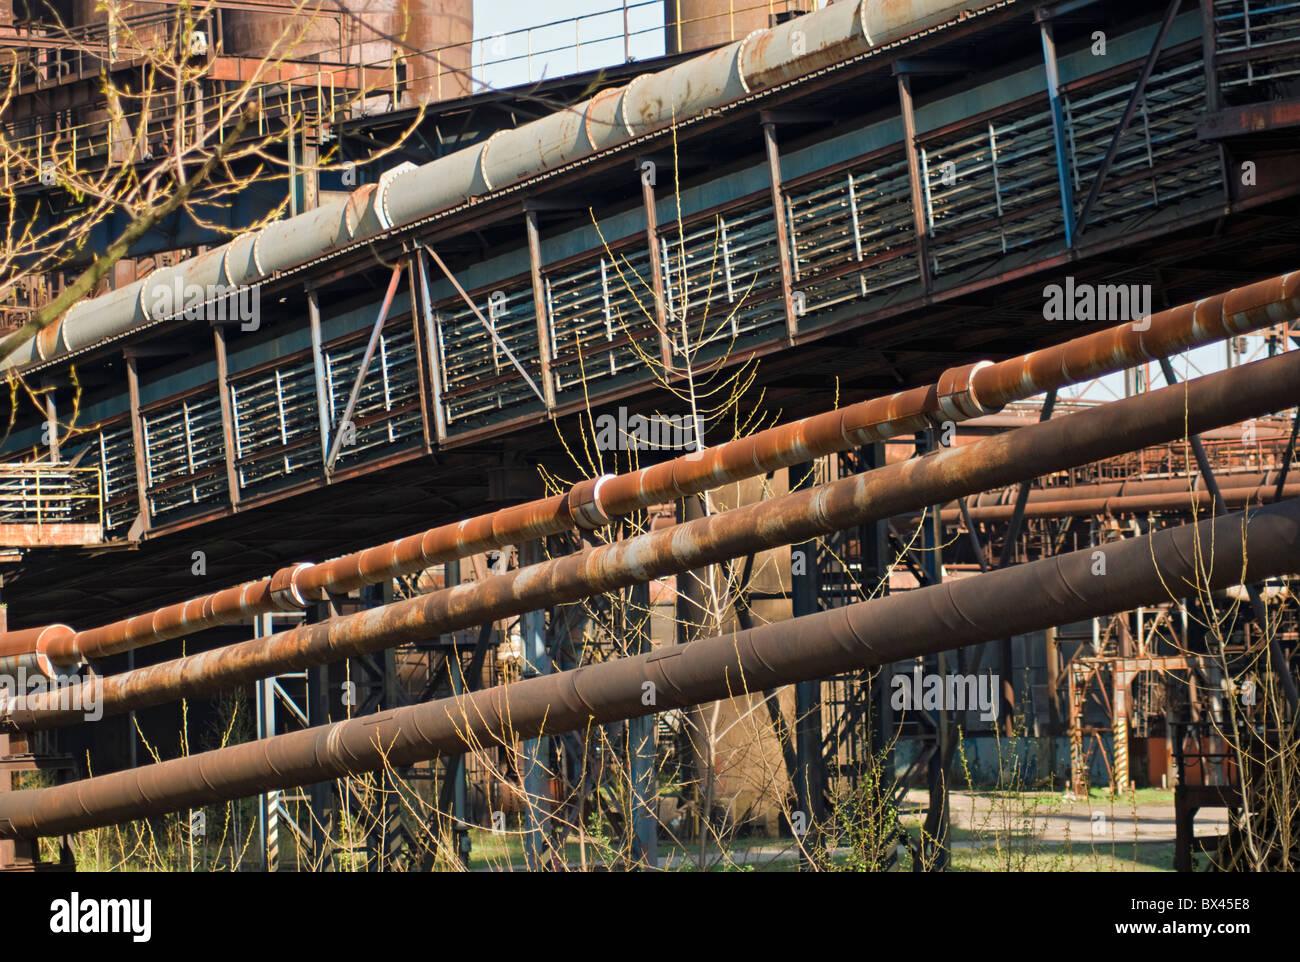 Pipelines, Vitkovice Iron and Steel Works, Ostrava, Moravian-Silesian Region, Czech Republic - Stock Image